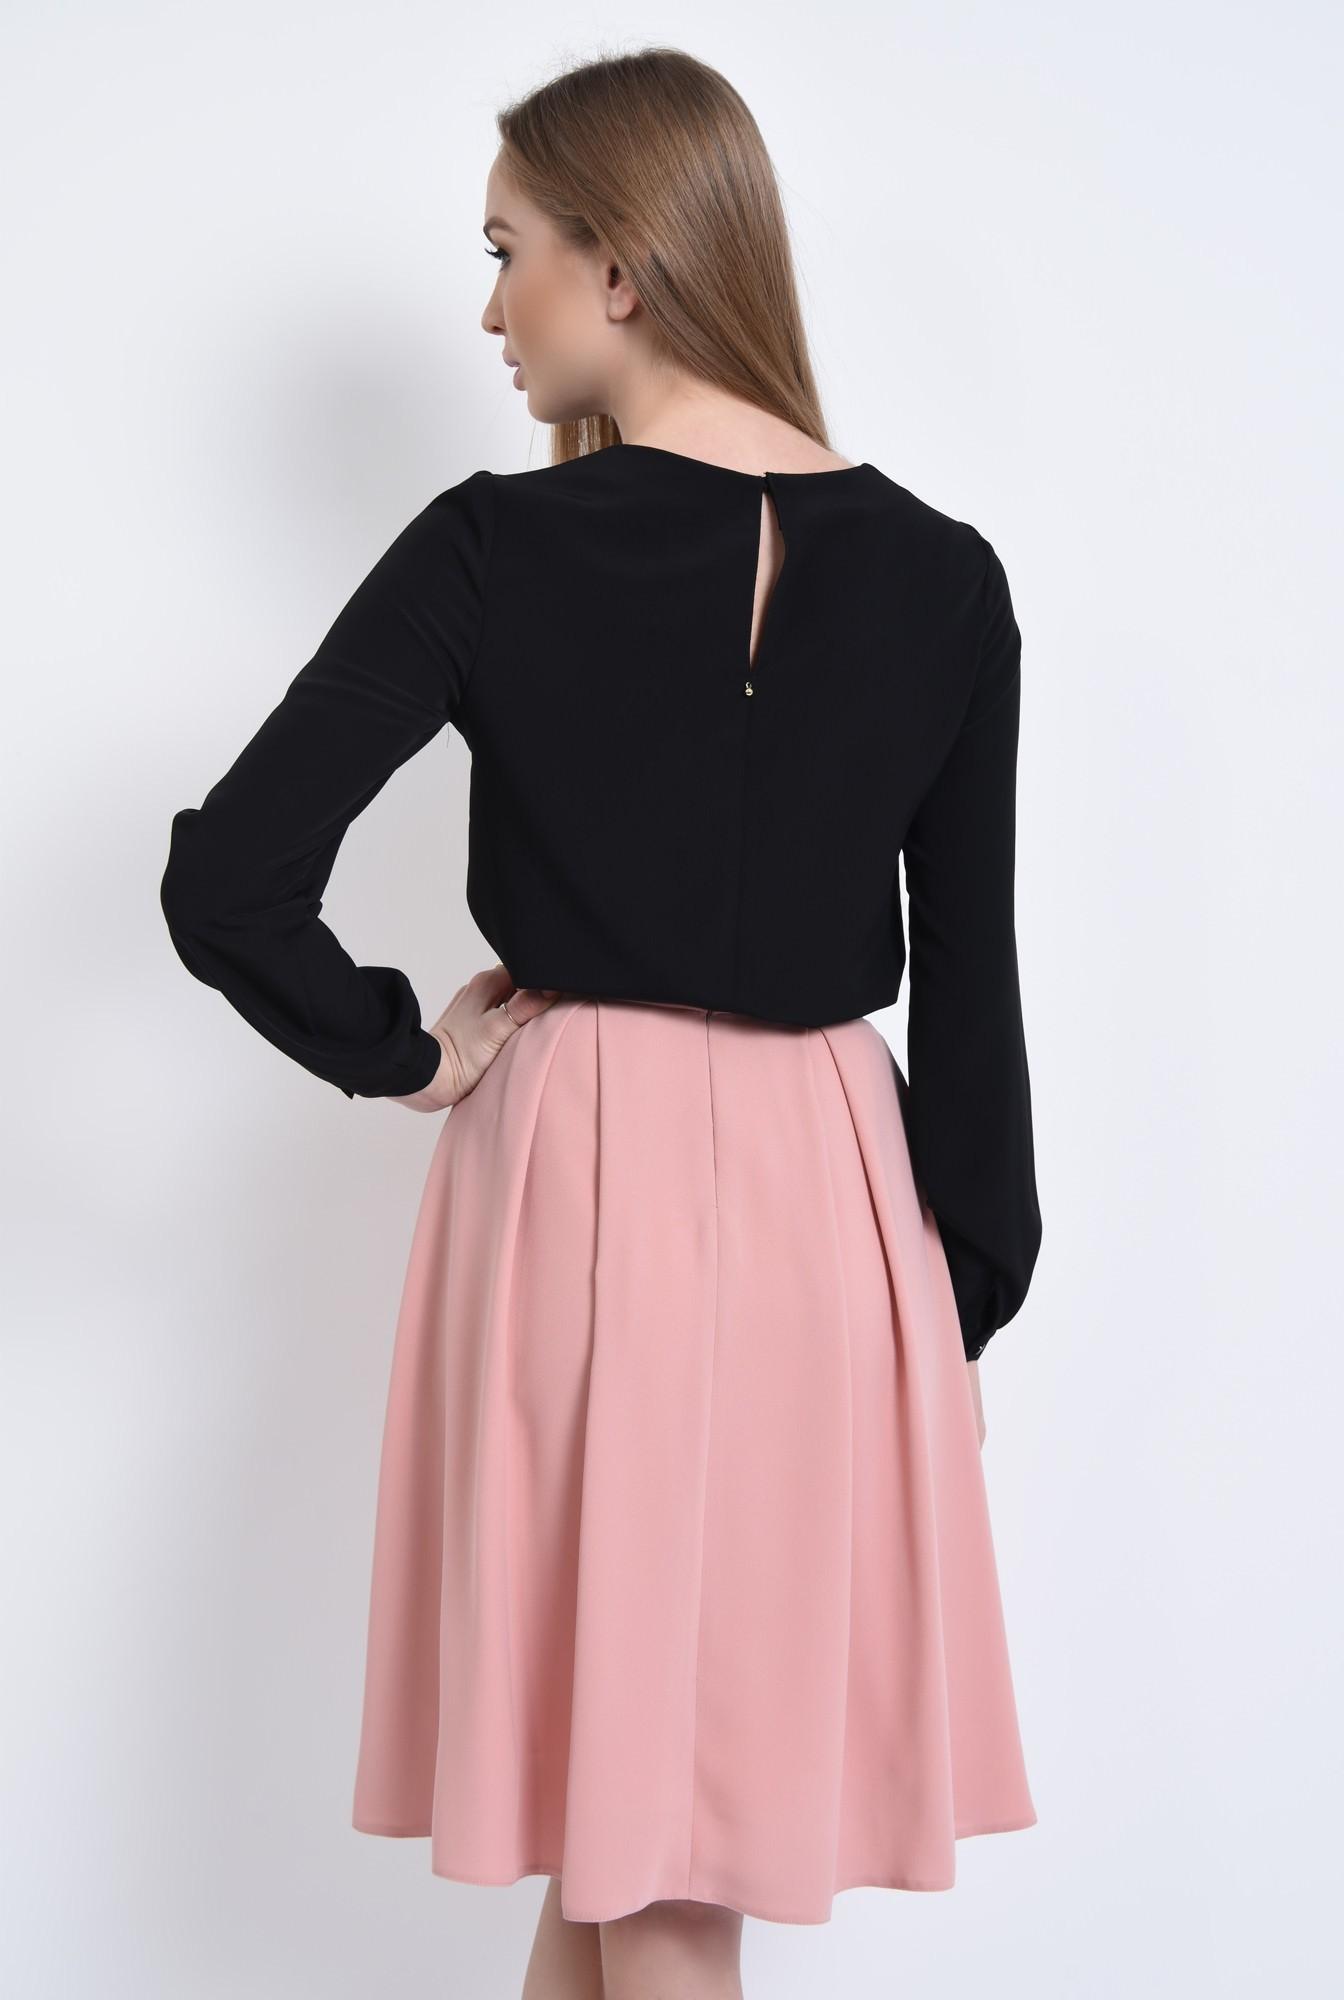 1 - Bluza din sifon, contrast, maneci lungi